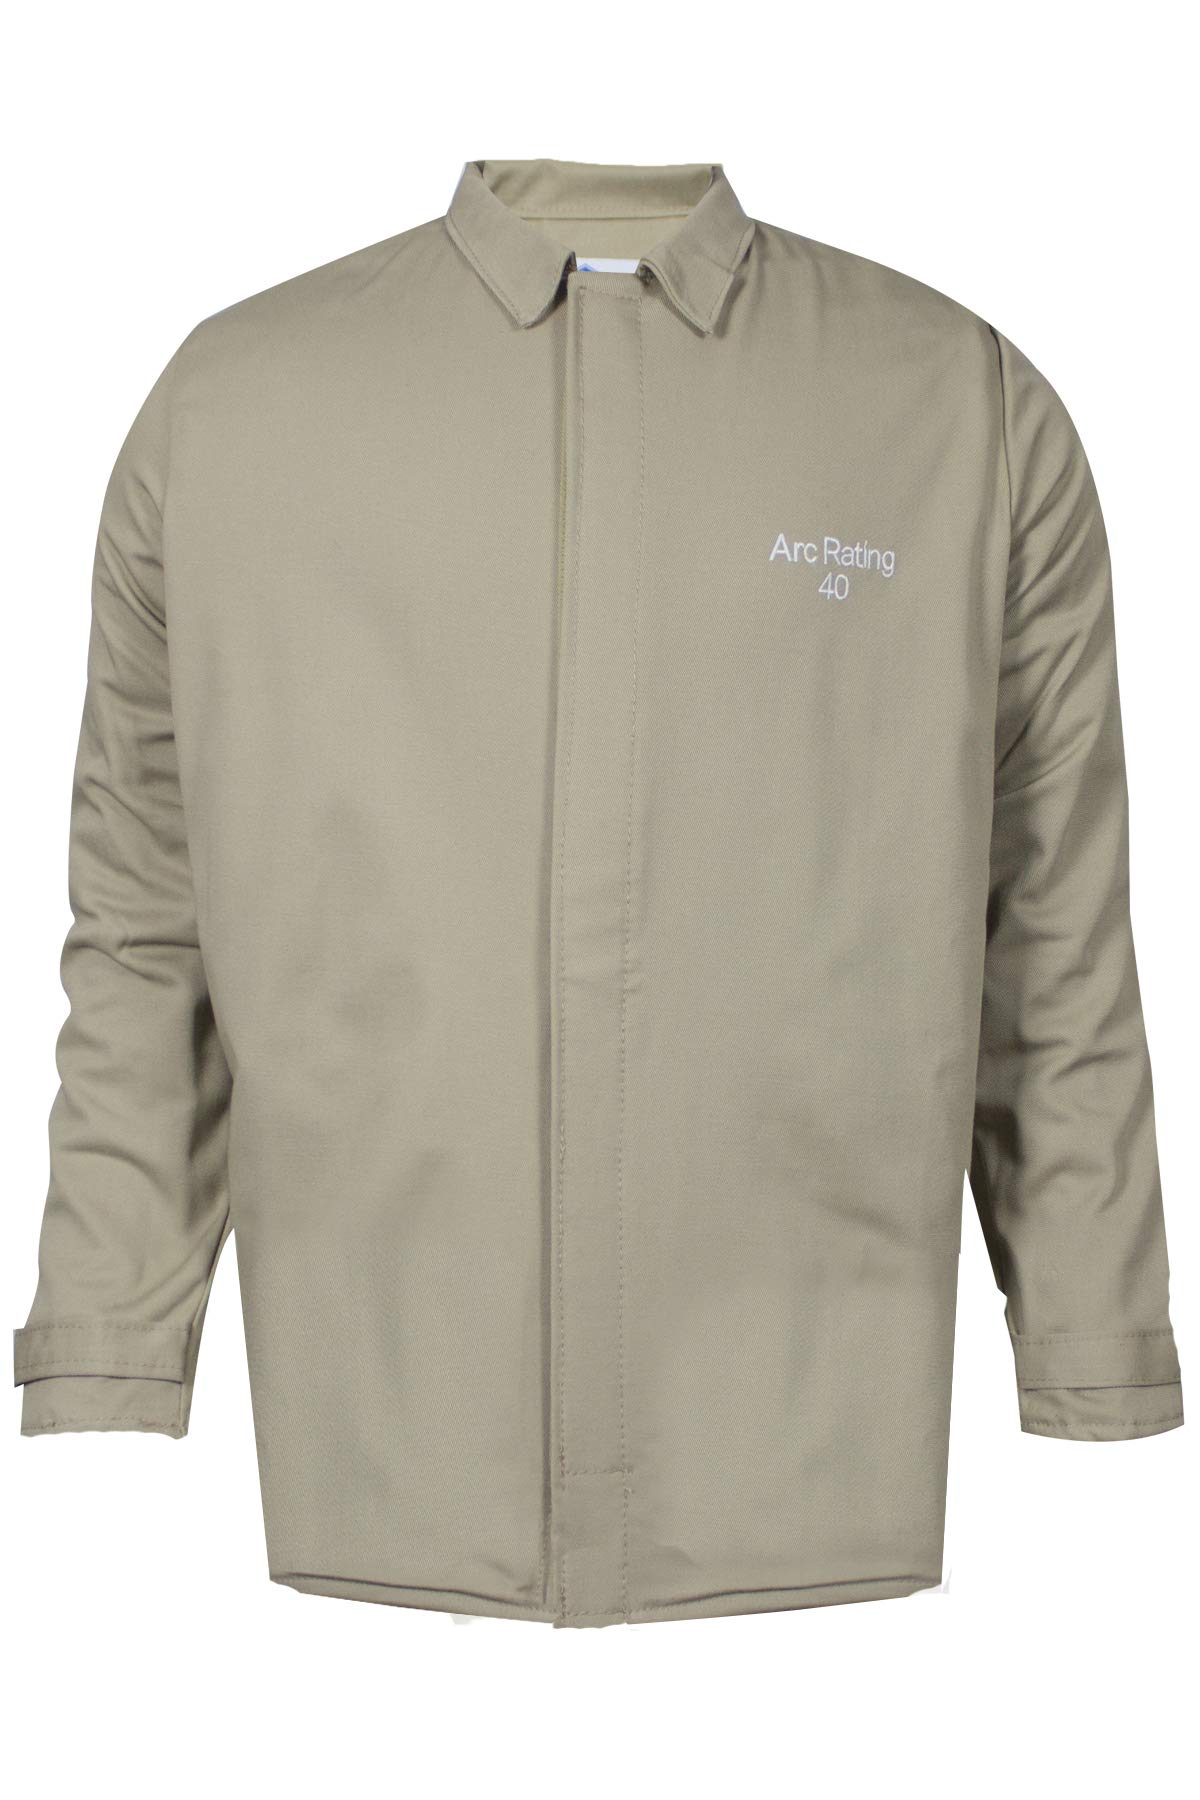 National Safety Apparel ArcGuard Economy Arc Flash Short Coat, Khaki by National Safety Apparel Inc (Image #1)